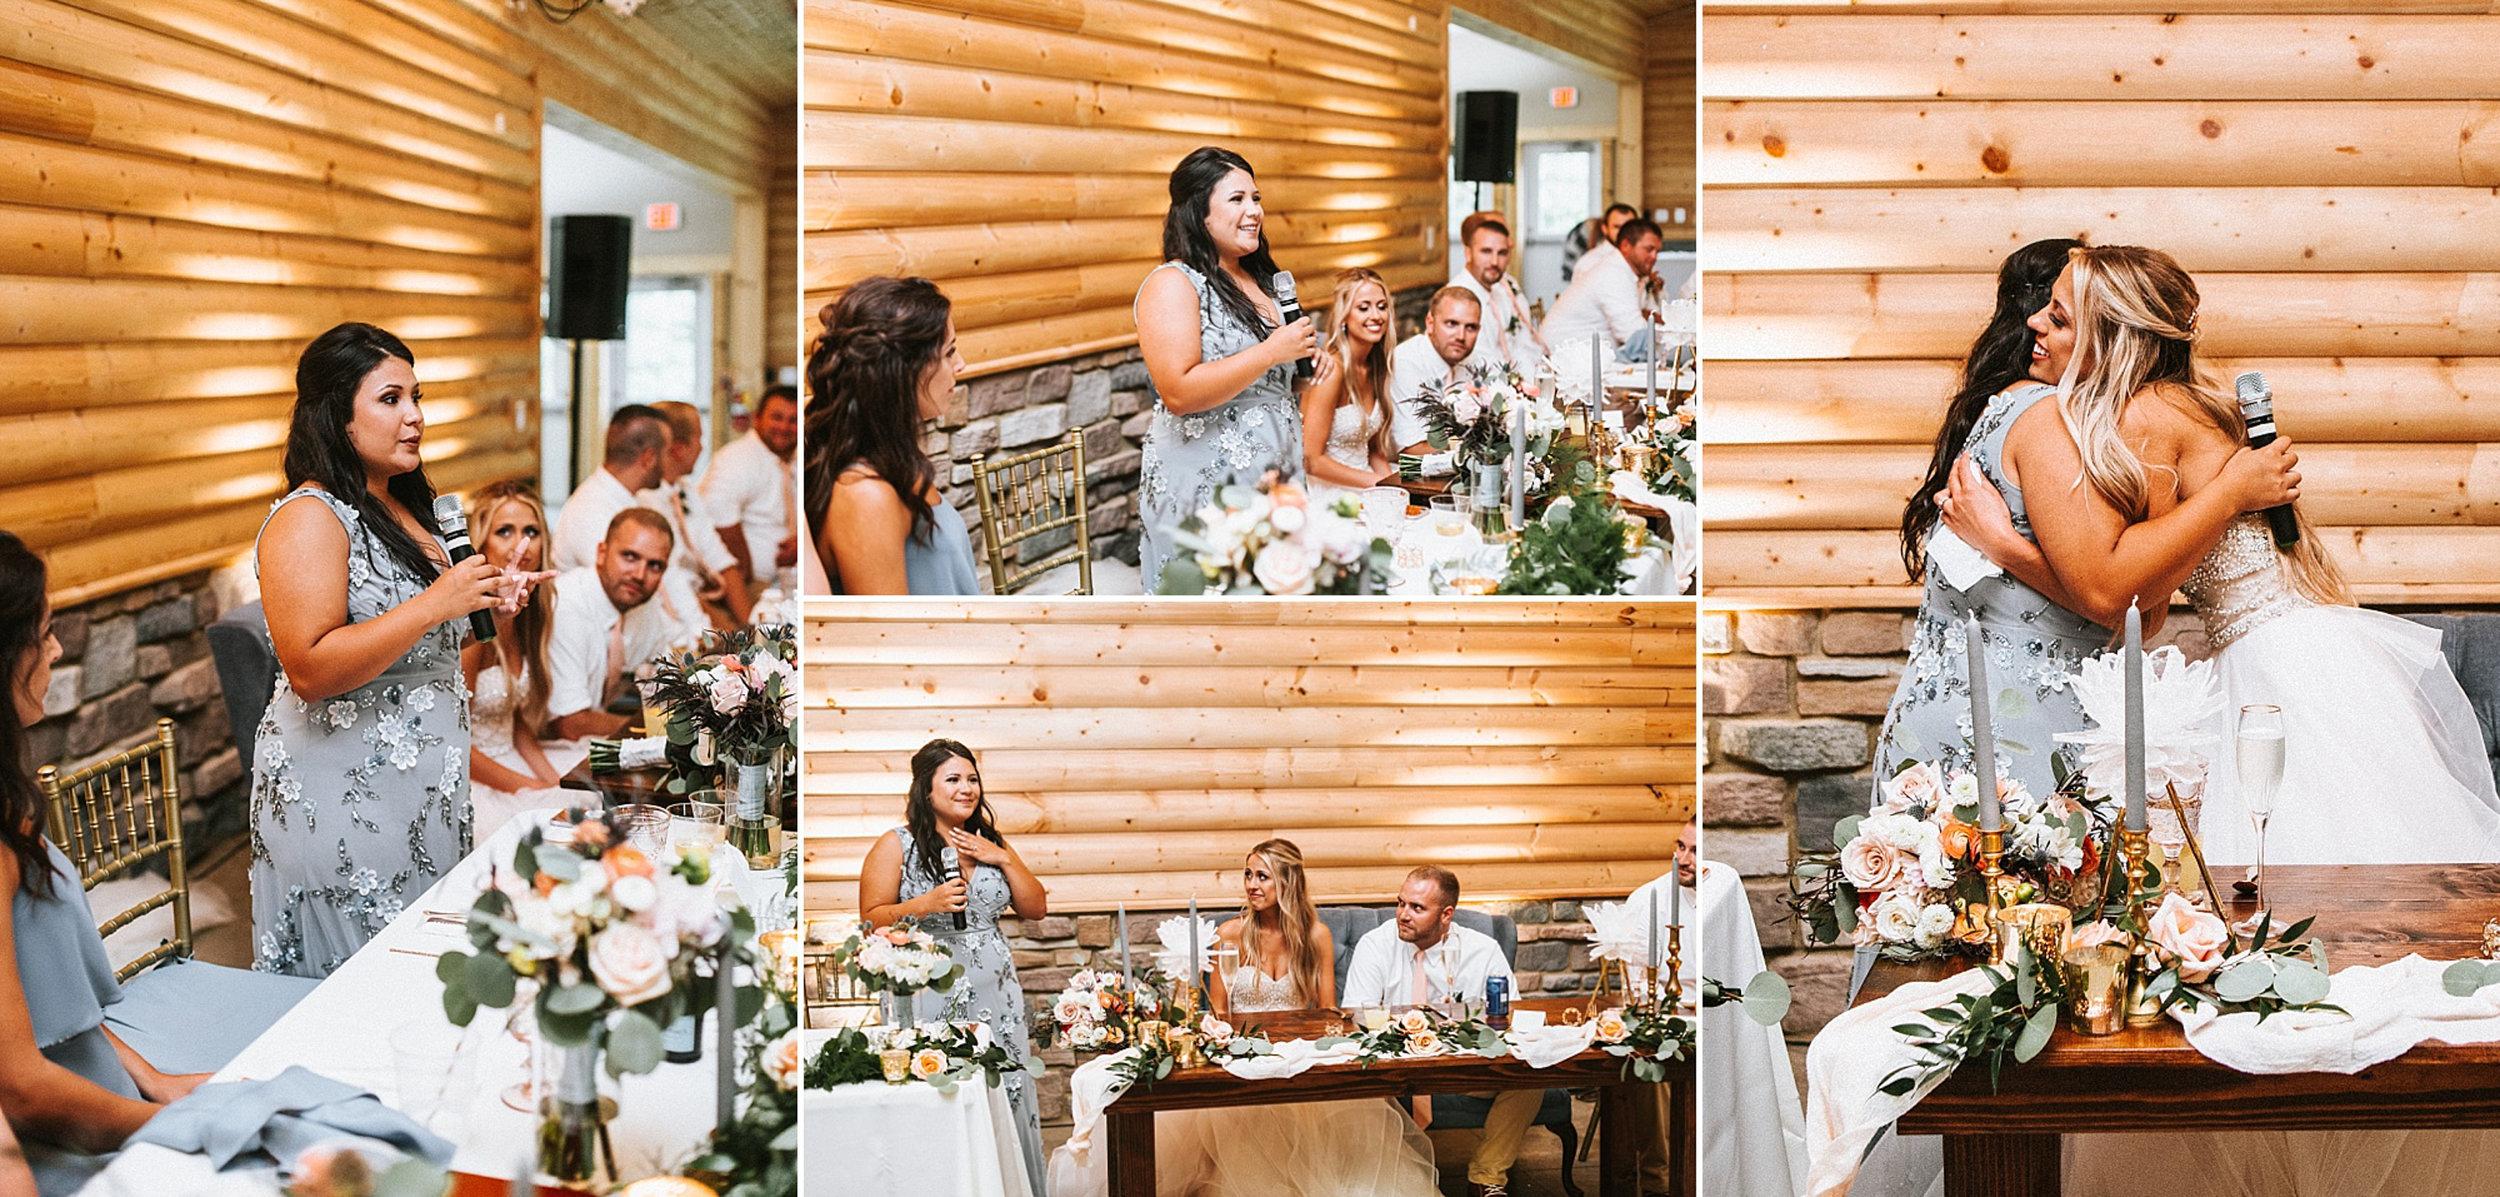 Brooke Townsend Photography - Cincinnati Wedding Photographer (136 of 153).jpg